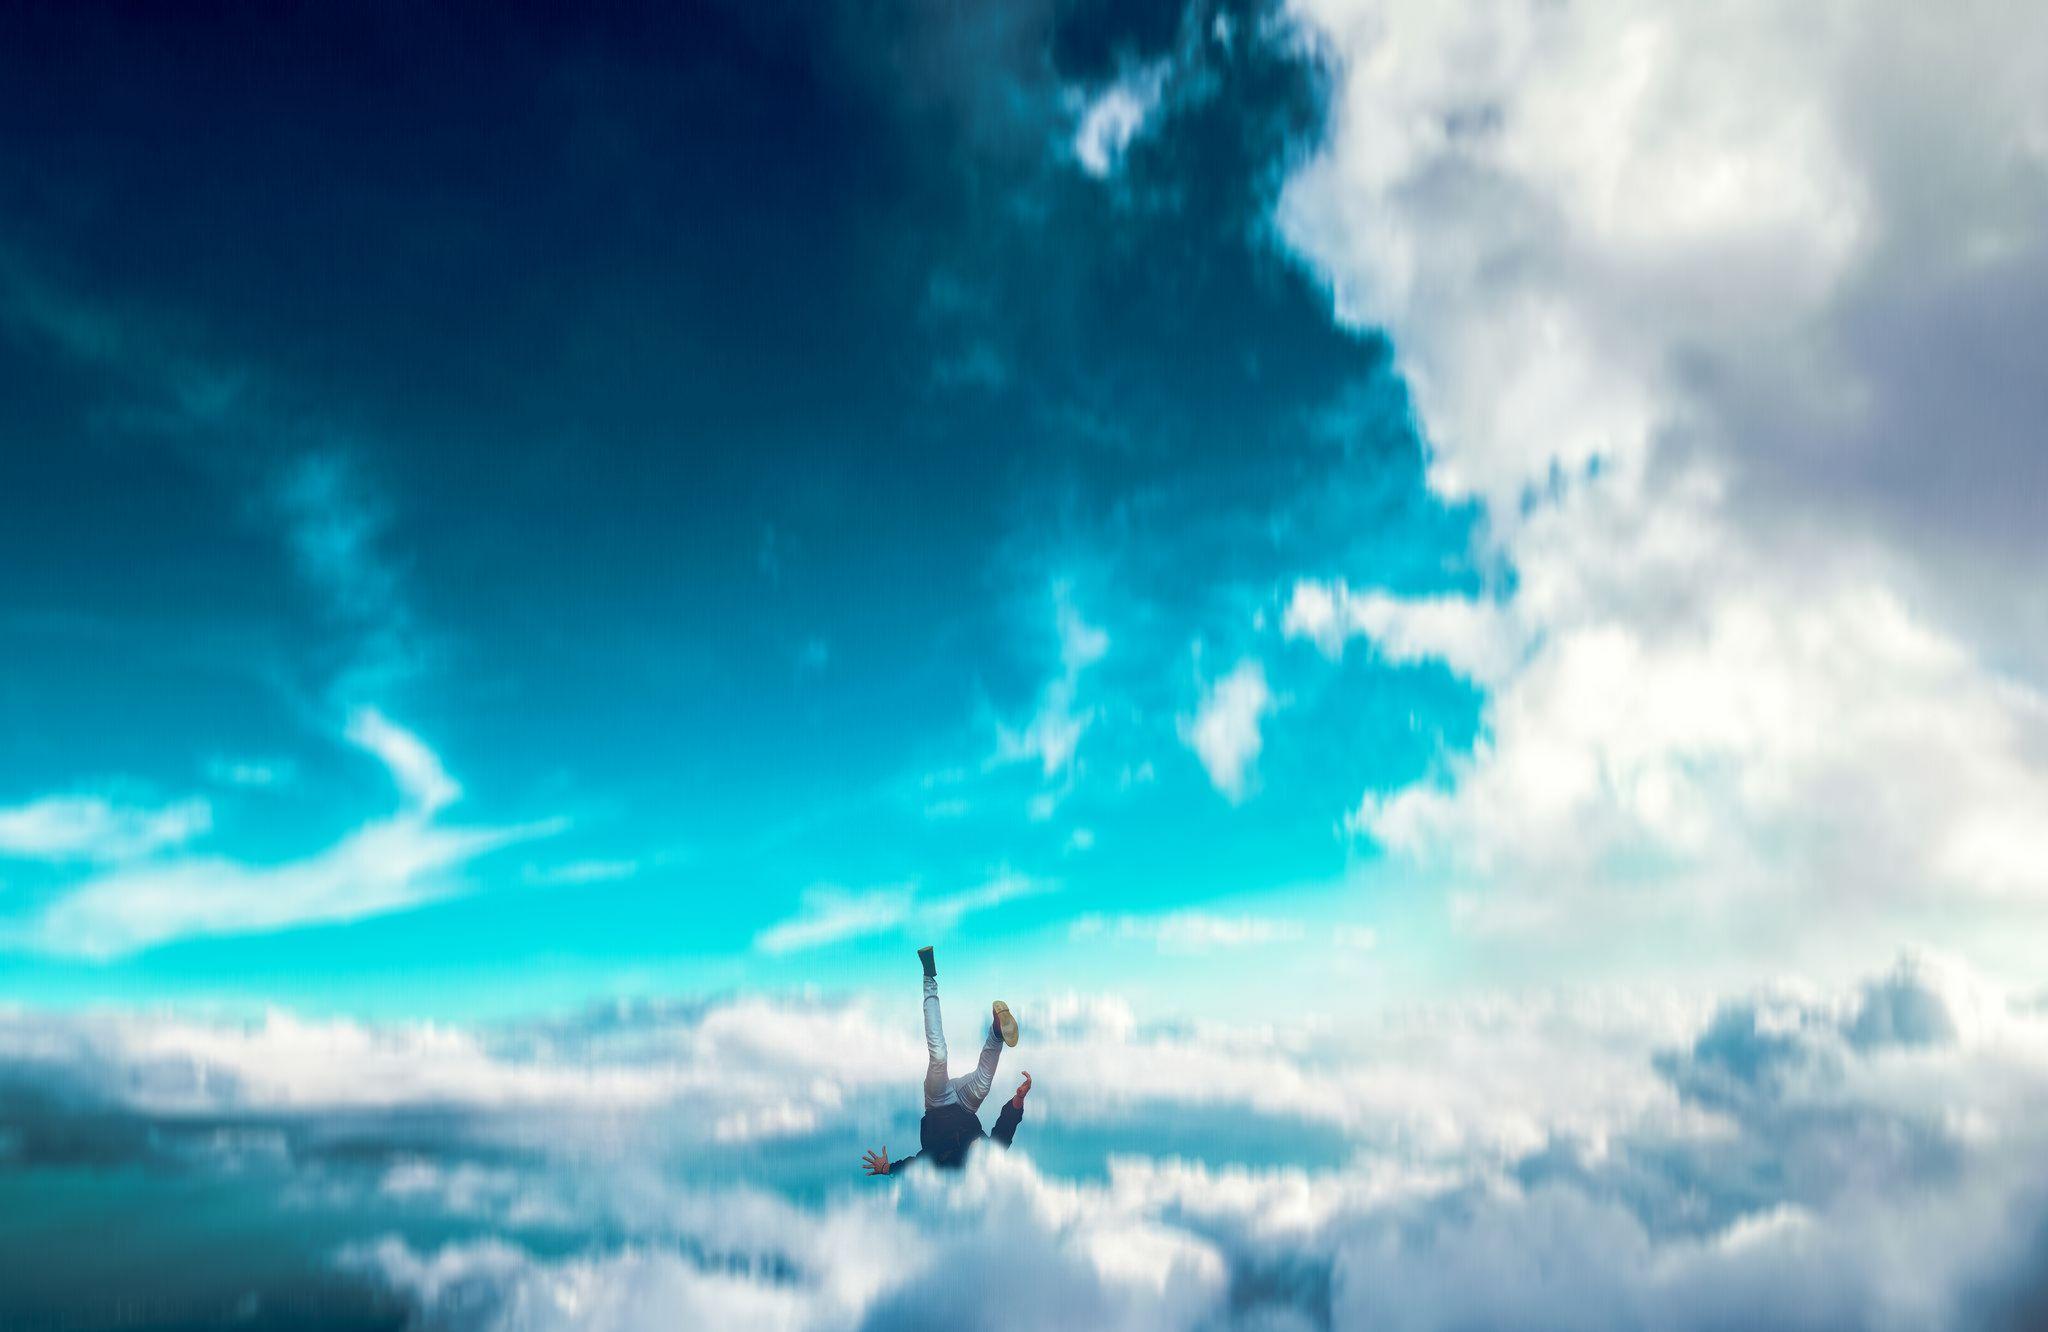 356/365 falling (Pt. 3) Clouds wallpaper iphone, Blue